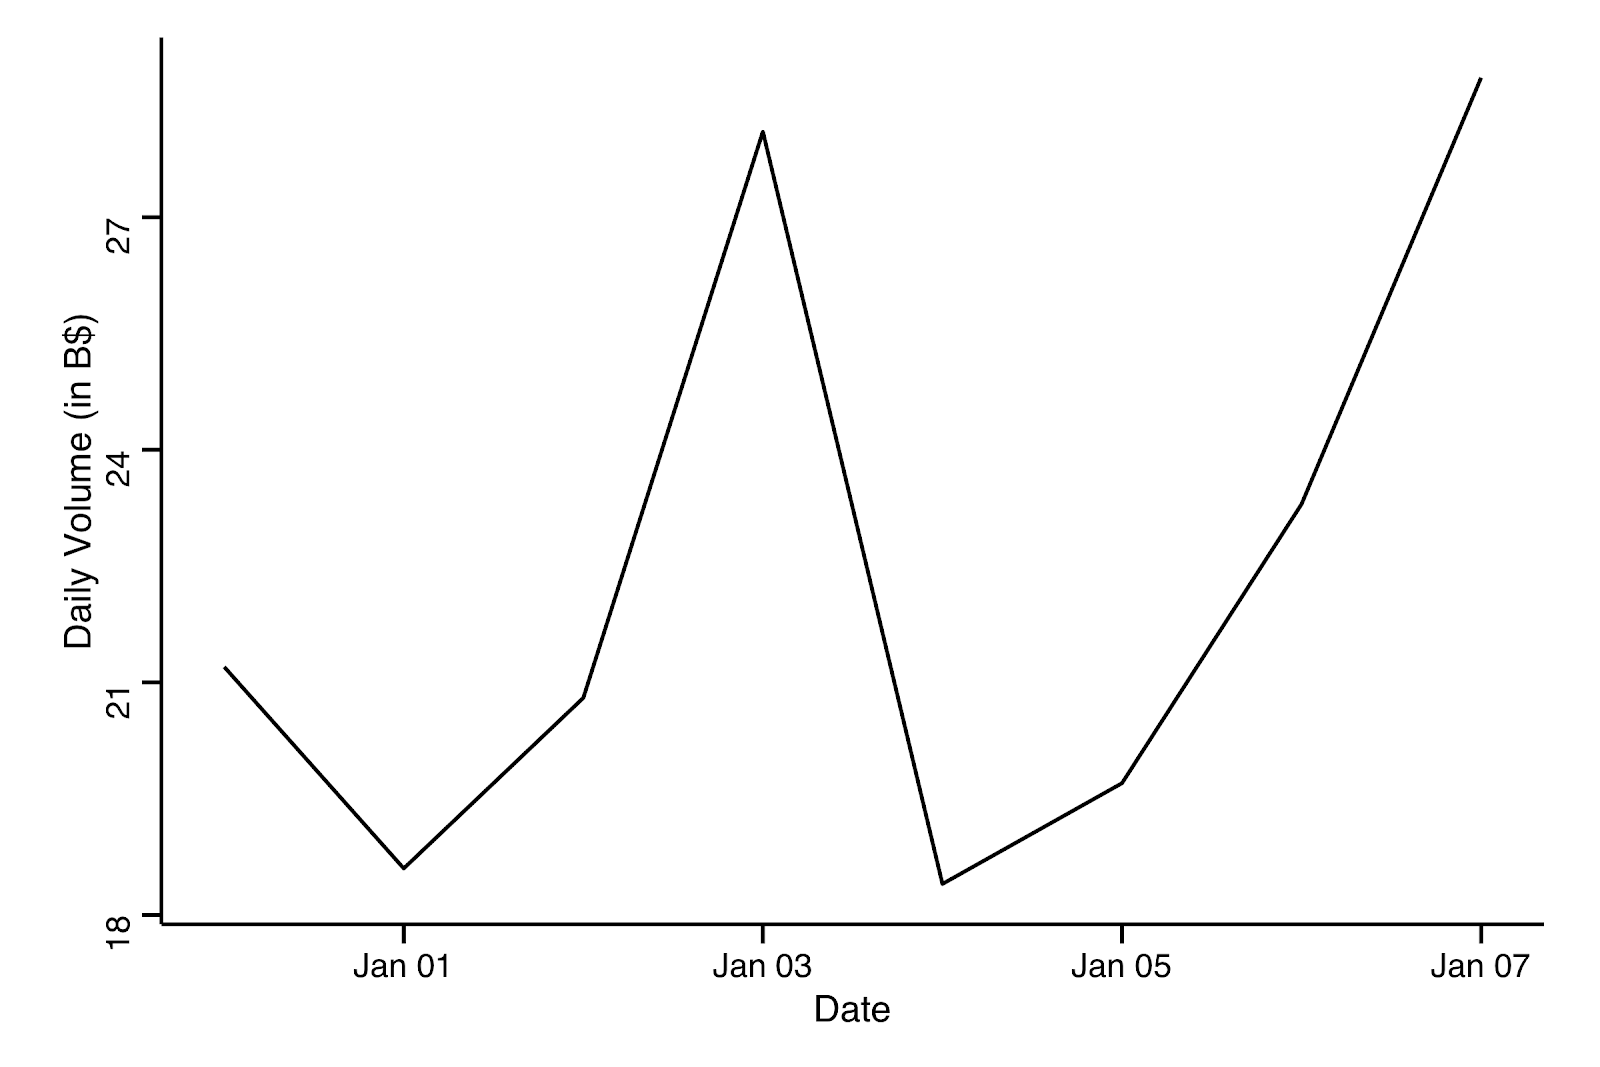 Figure 3: Bitcoin's Daily Volume in the last 7 days. Data source: Coinmarketcap